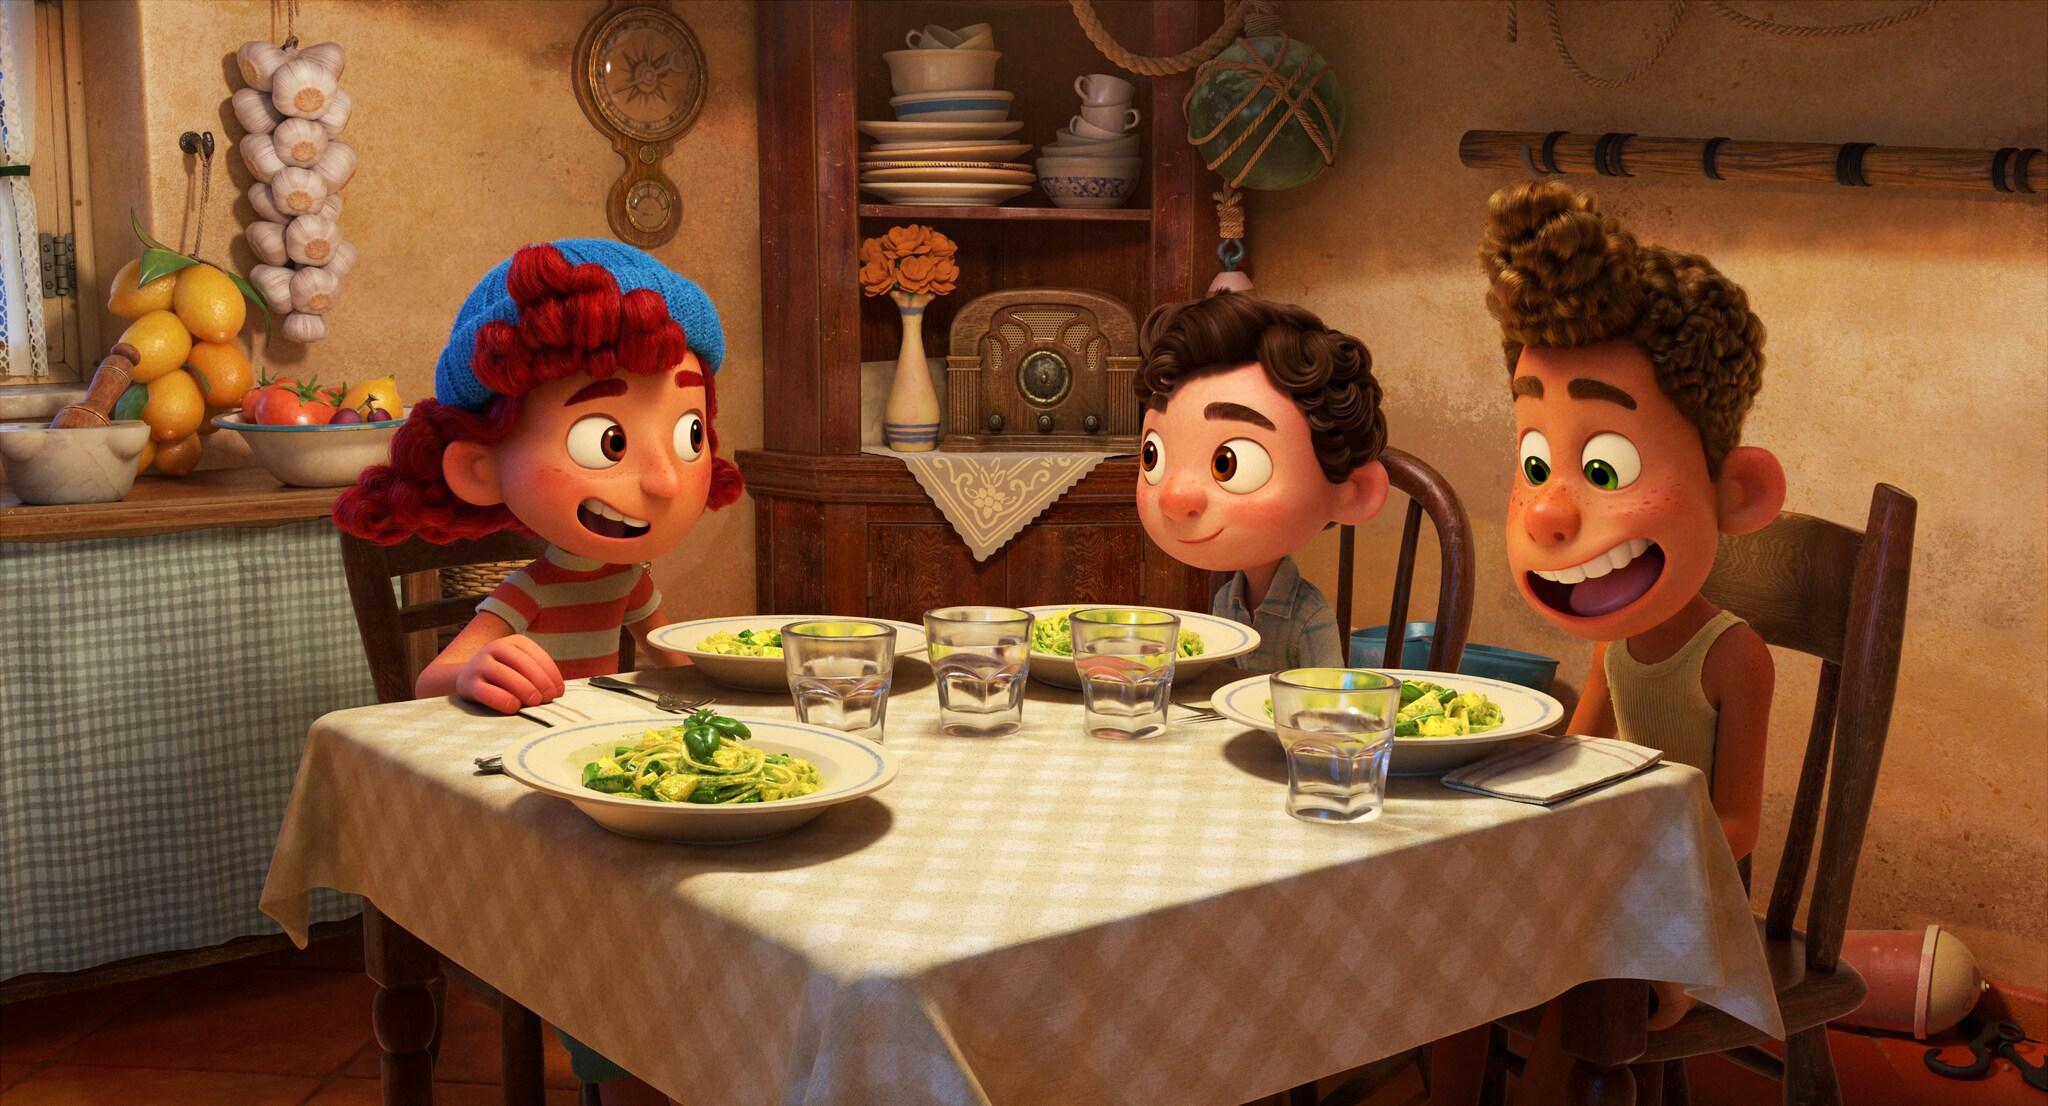 Luca, Alberto, and Guilia eat pasta